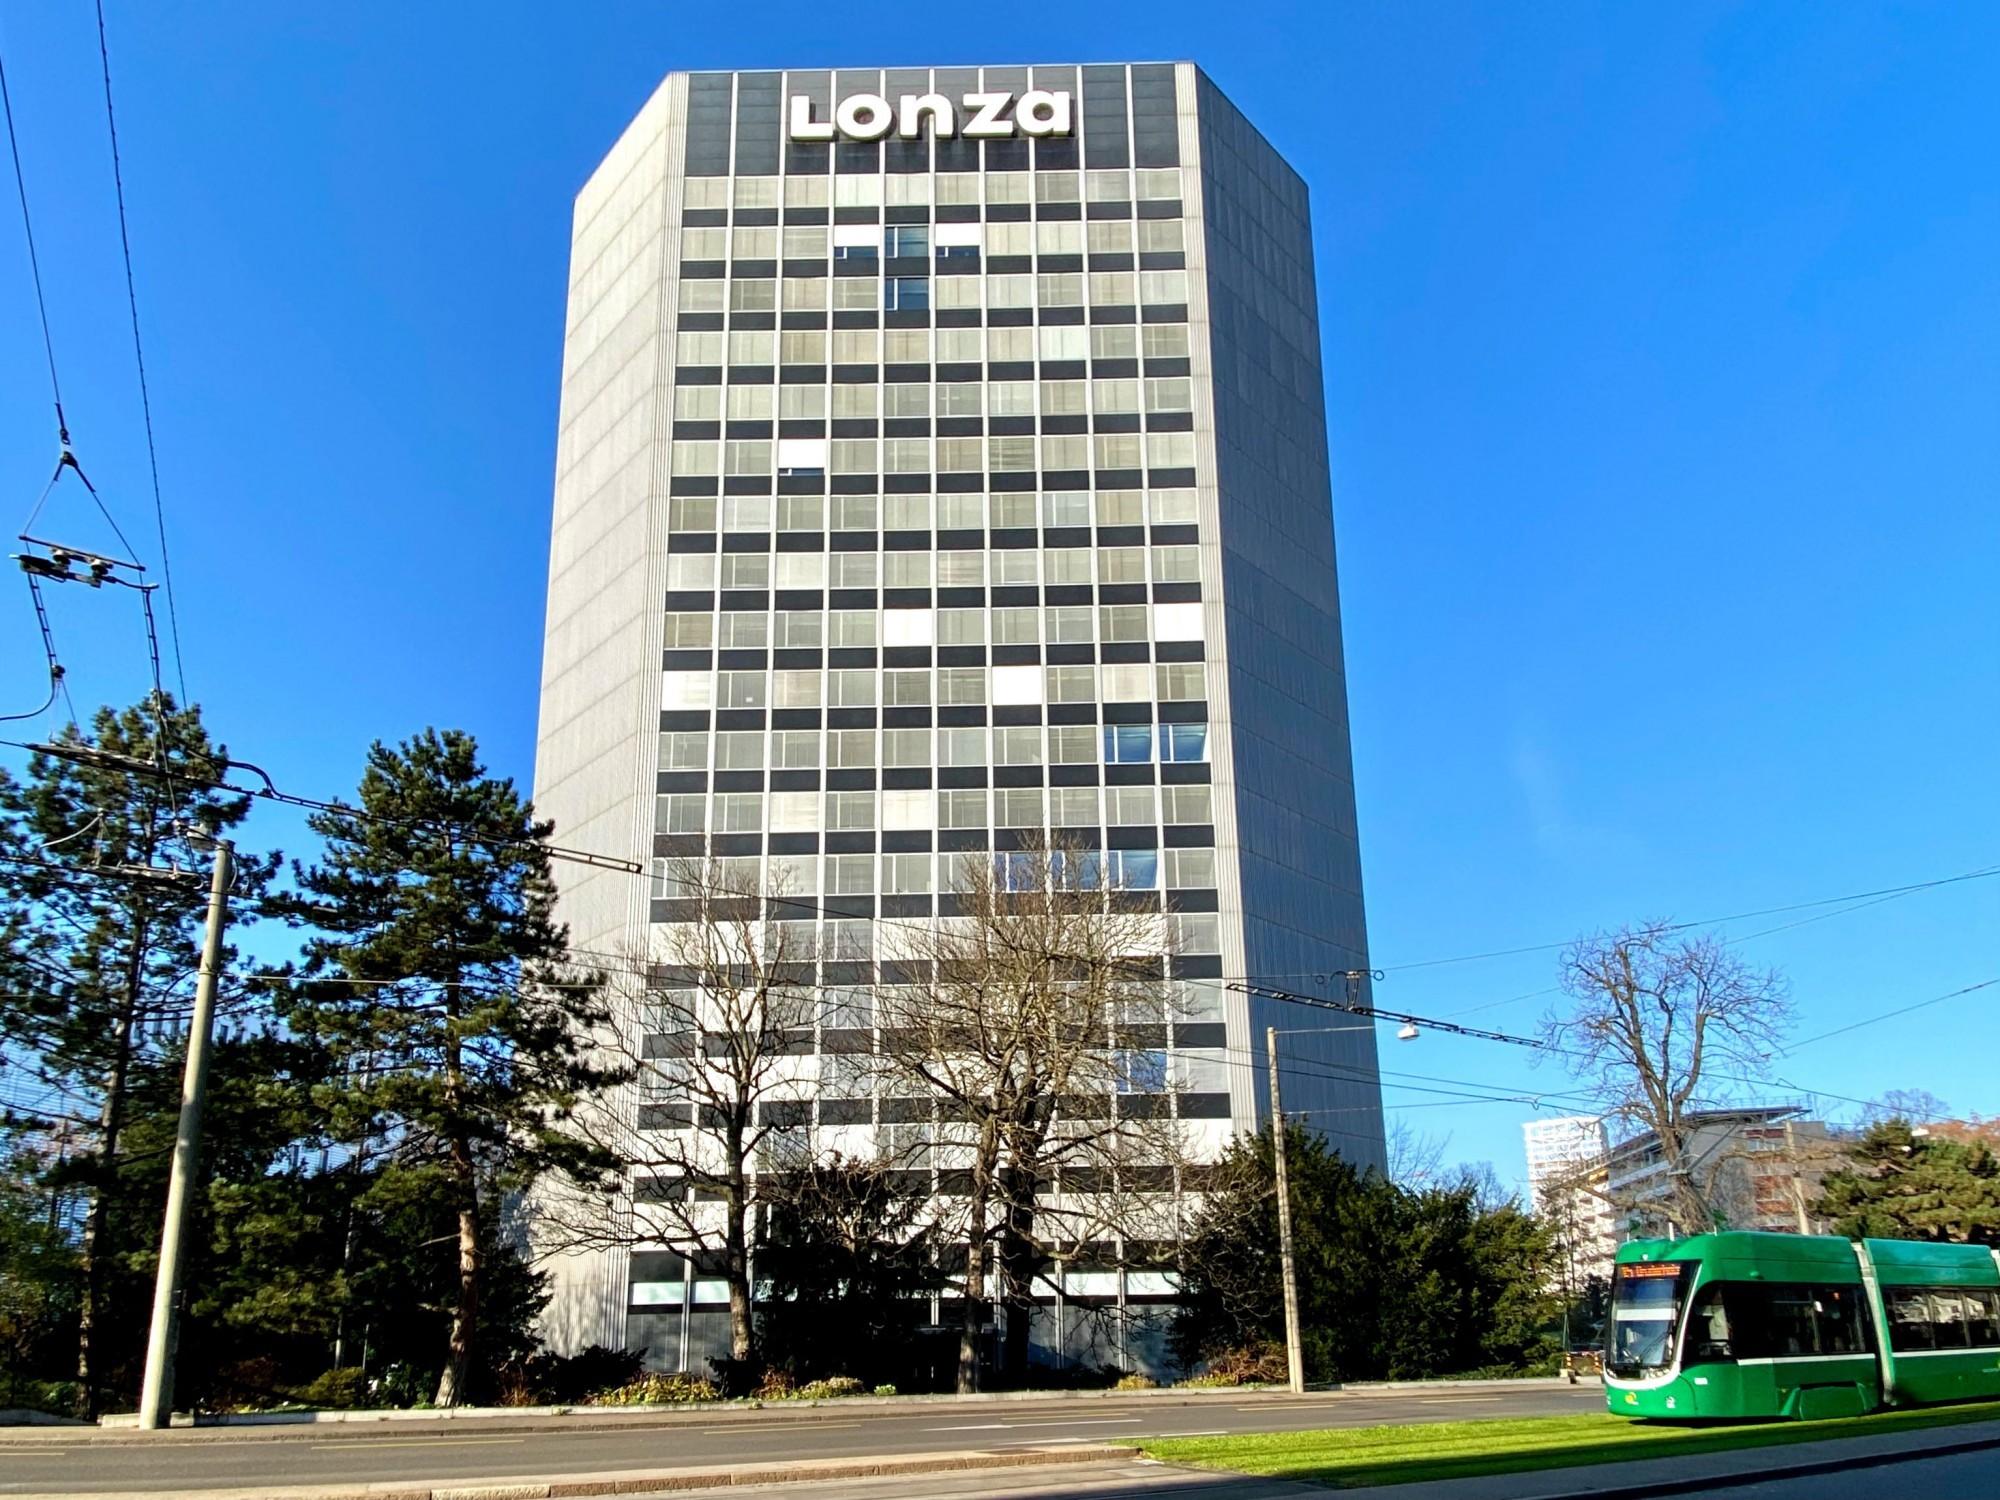 Lonza Turm Hochhaus Basel